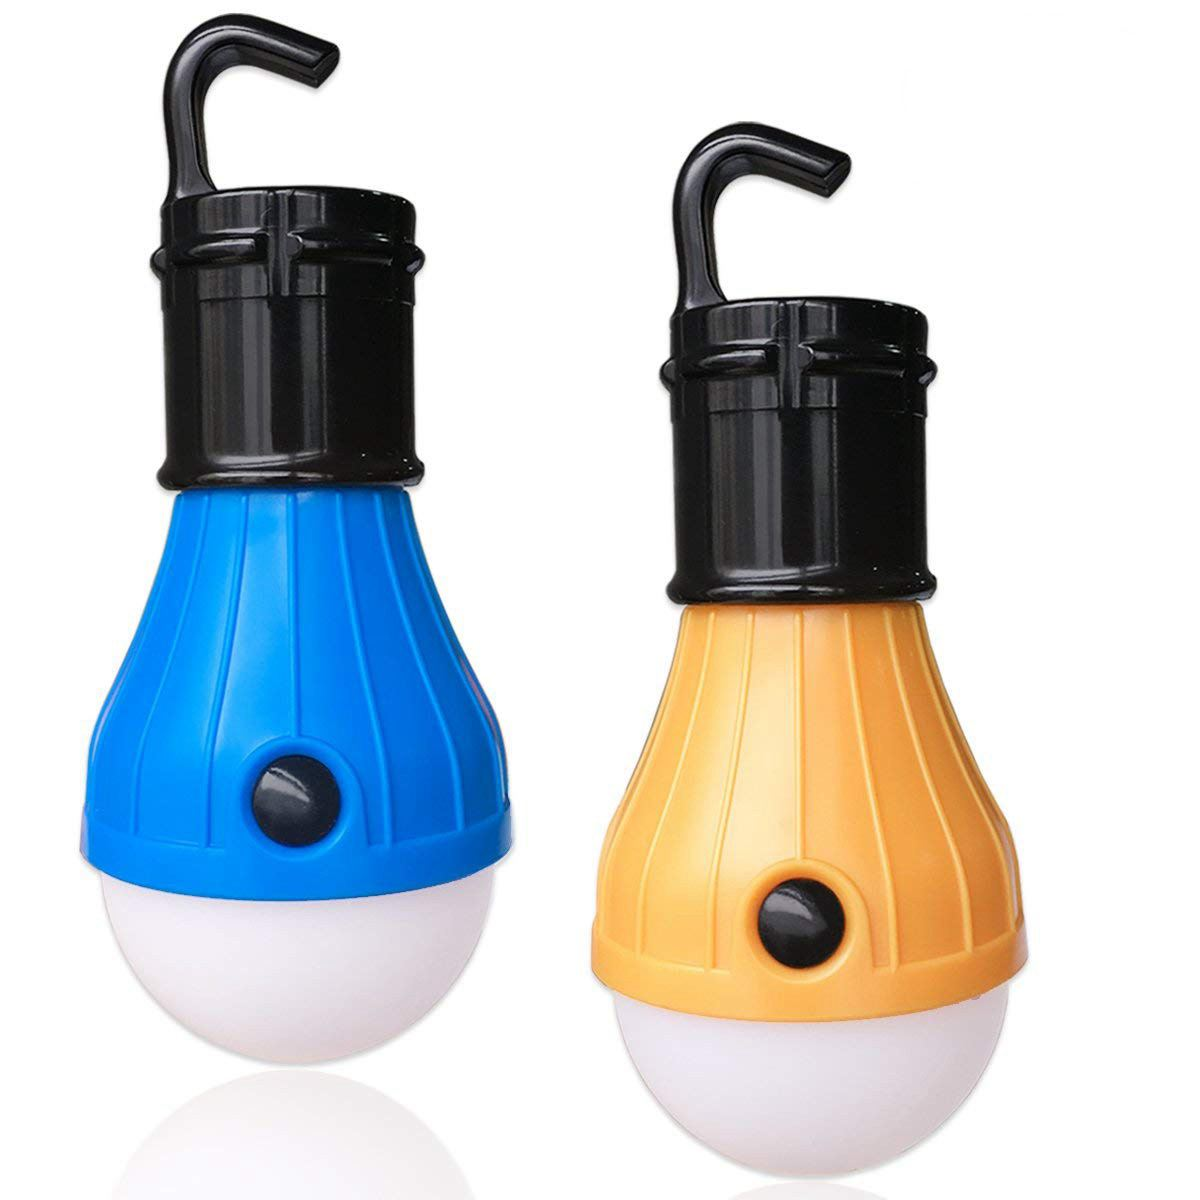 Zelt Lichter Notfall Licht Tragbare Batterie Betriebene Wasserdichte Led Camping Lichter Verwenden Camping Mountainee Bifi-camping Lichter